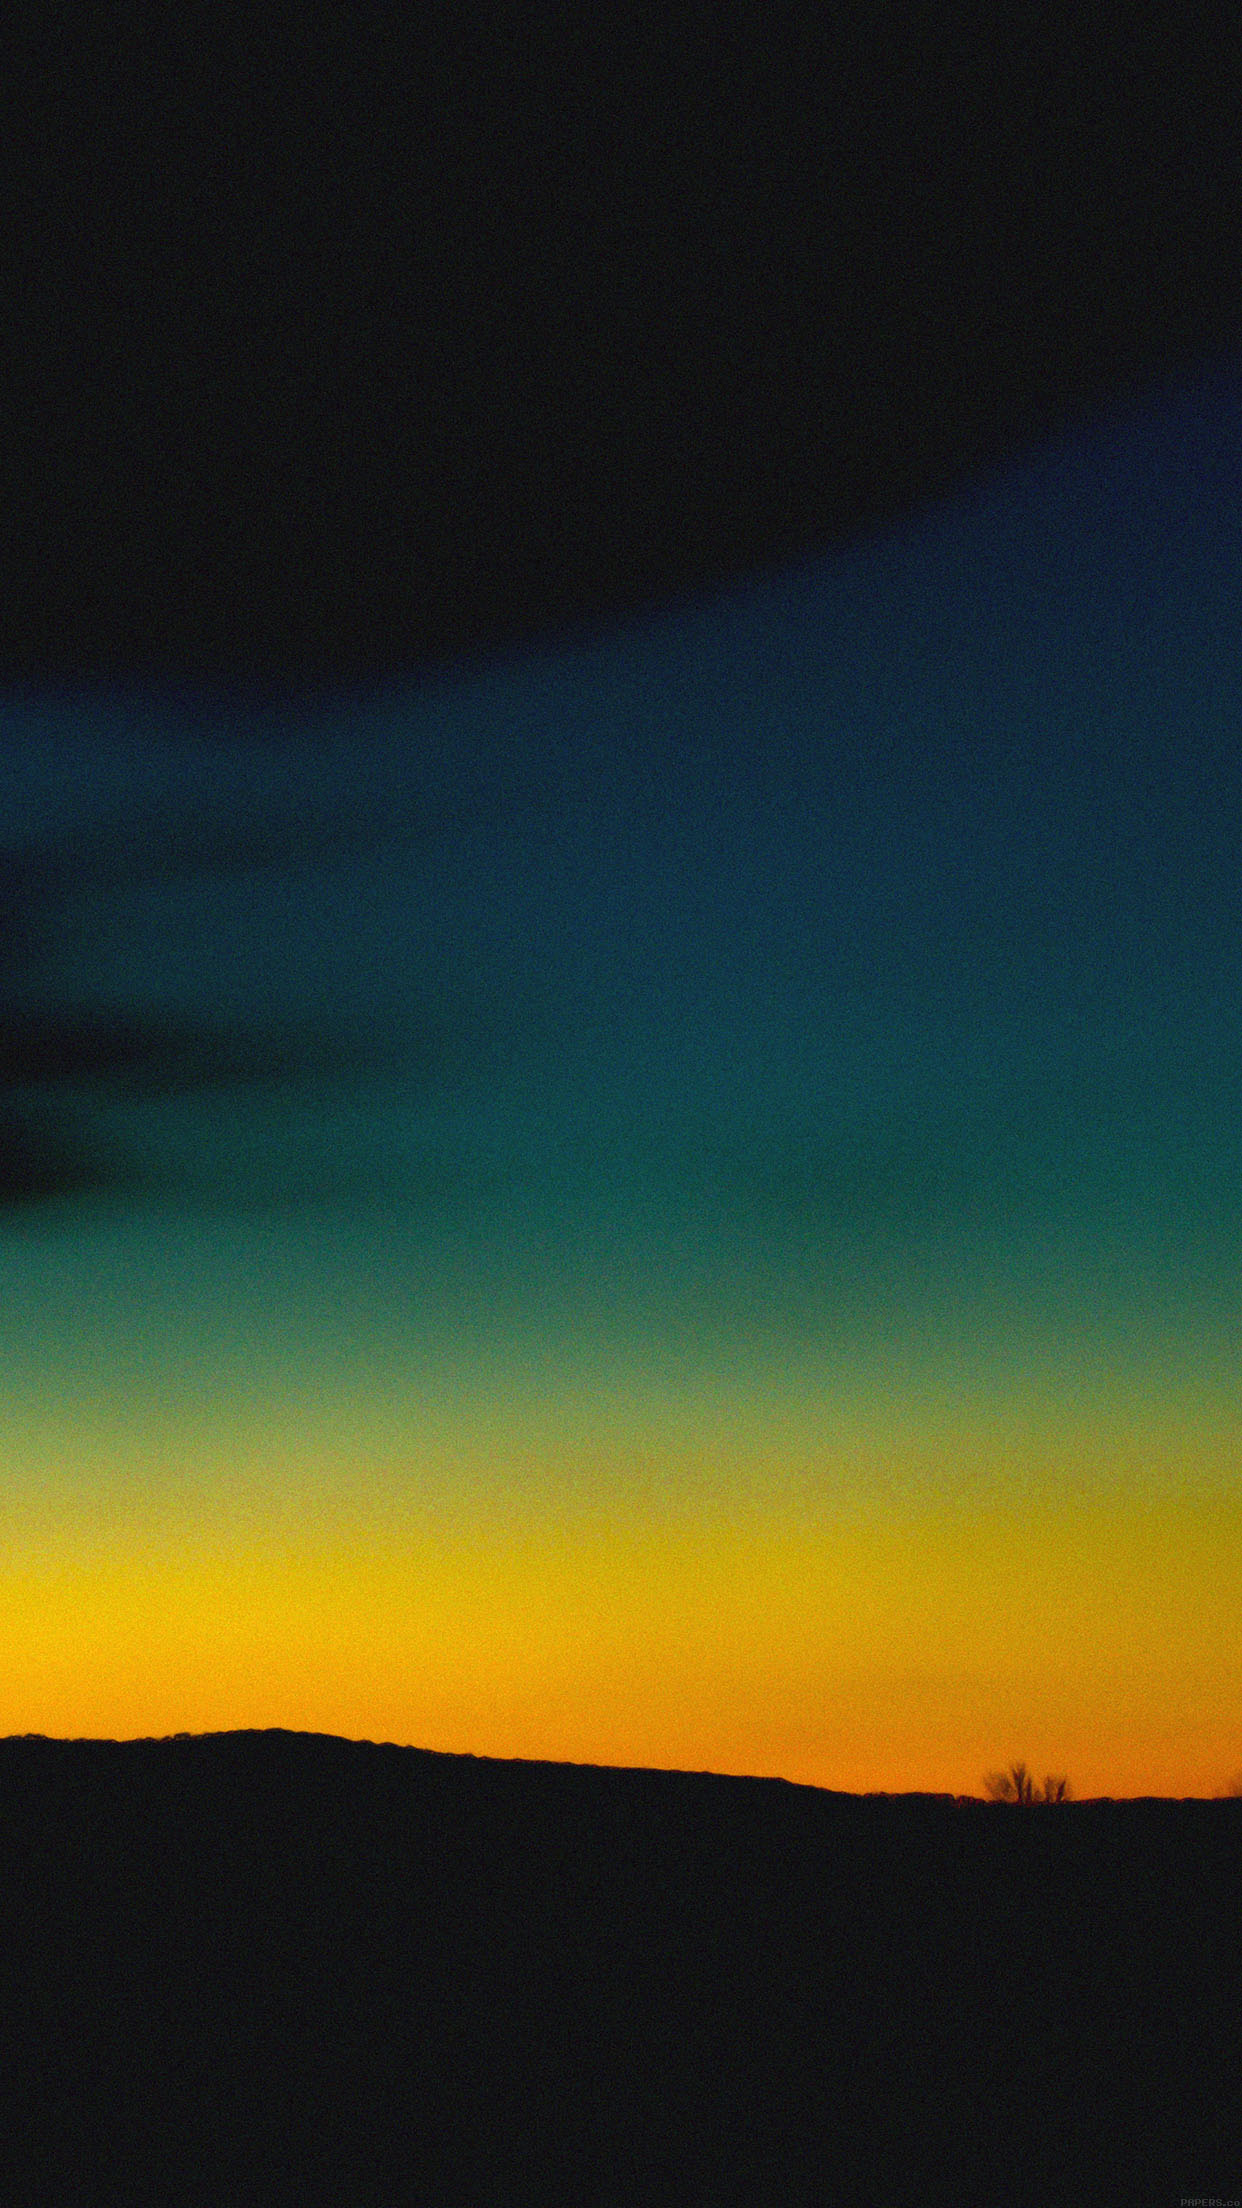 Iphone6papers Mc95 Wallpaper Orange Green Sky Sunset Nature